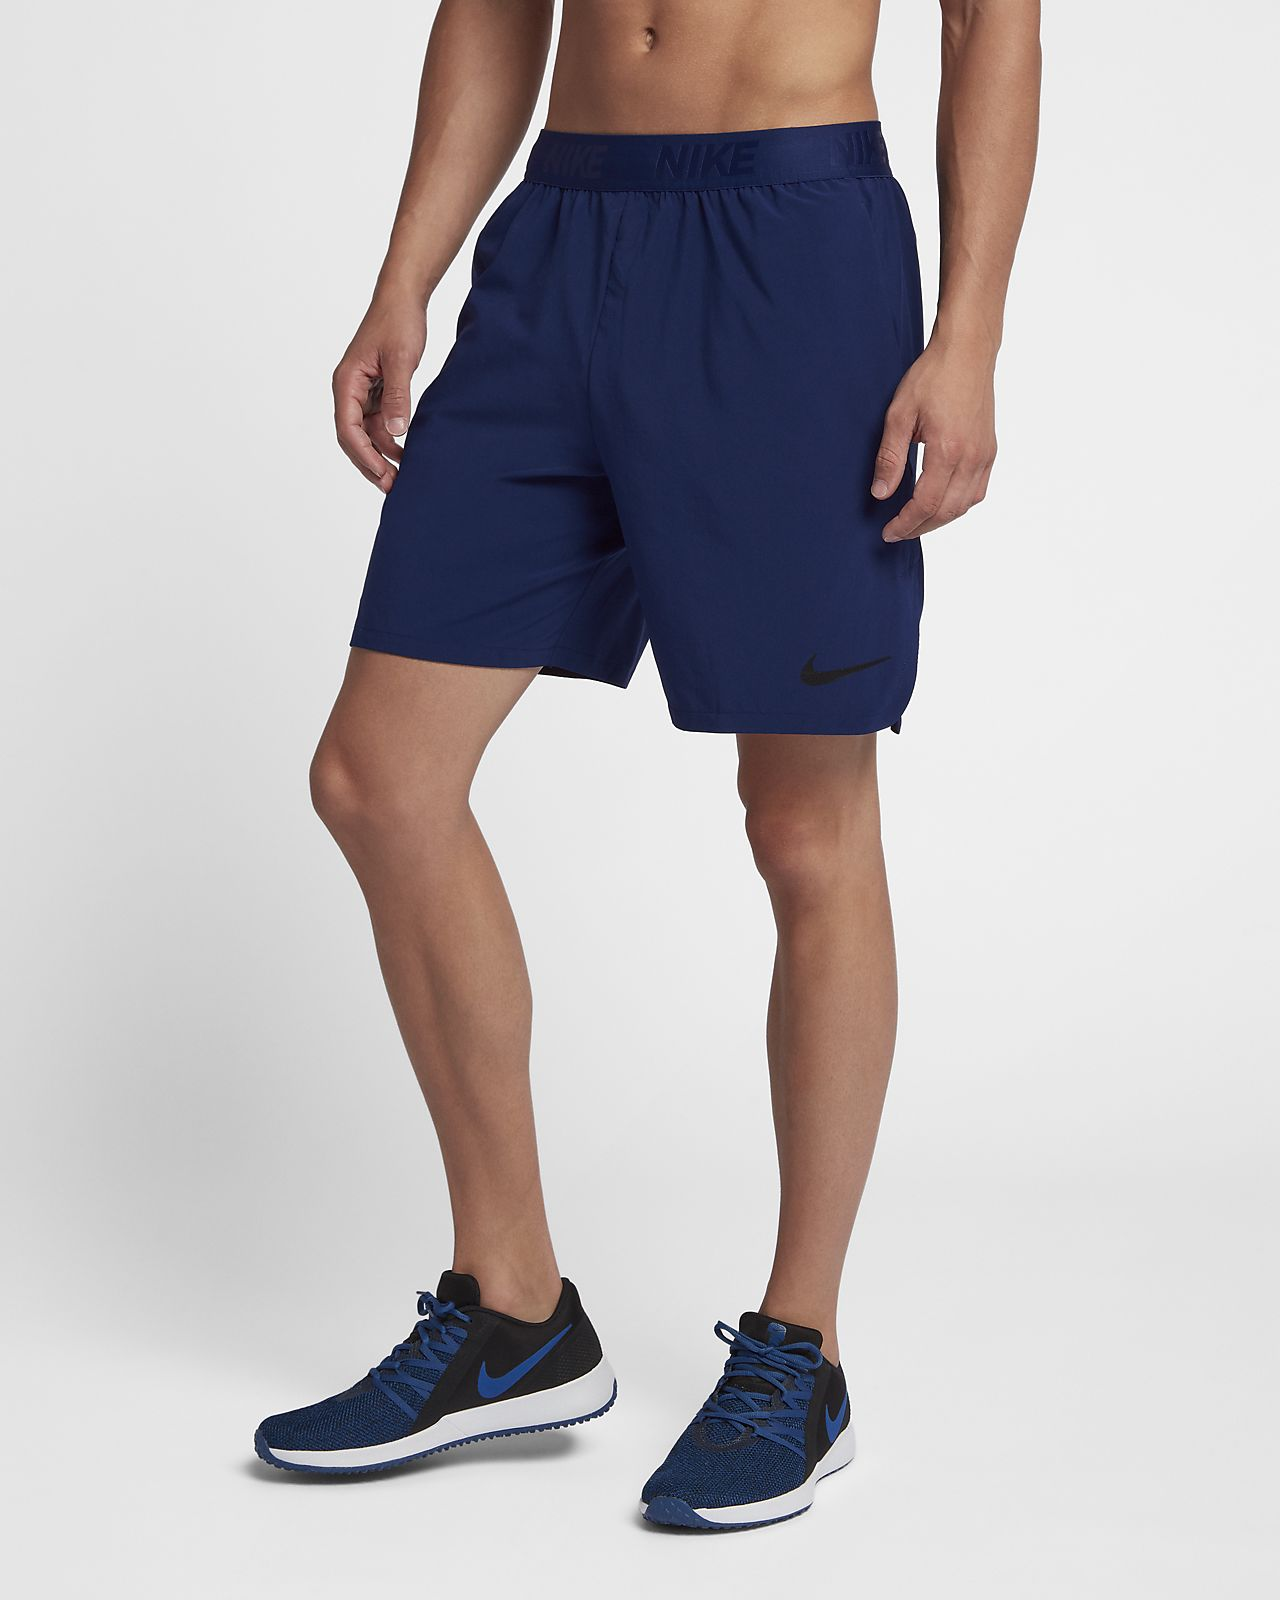 sneakers for cheap 00a35 ae63c Men s 21cm Training Shorts. Nike Flex